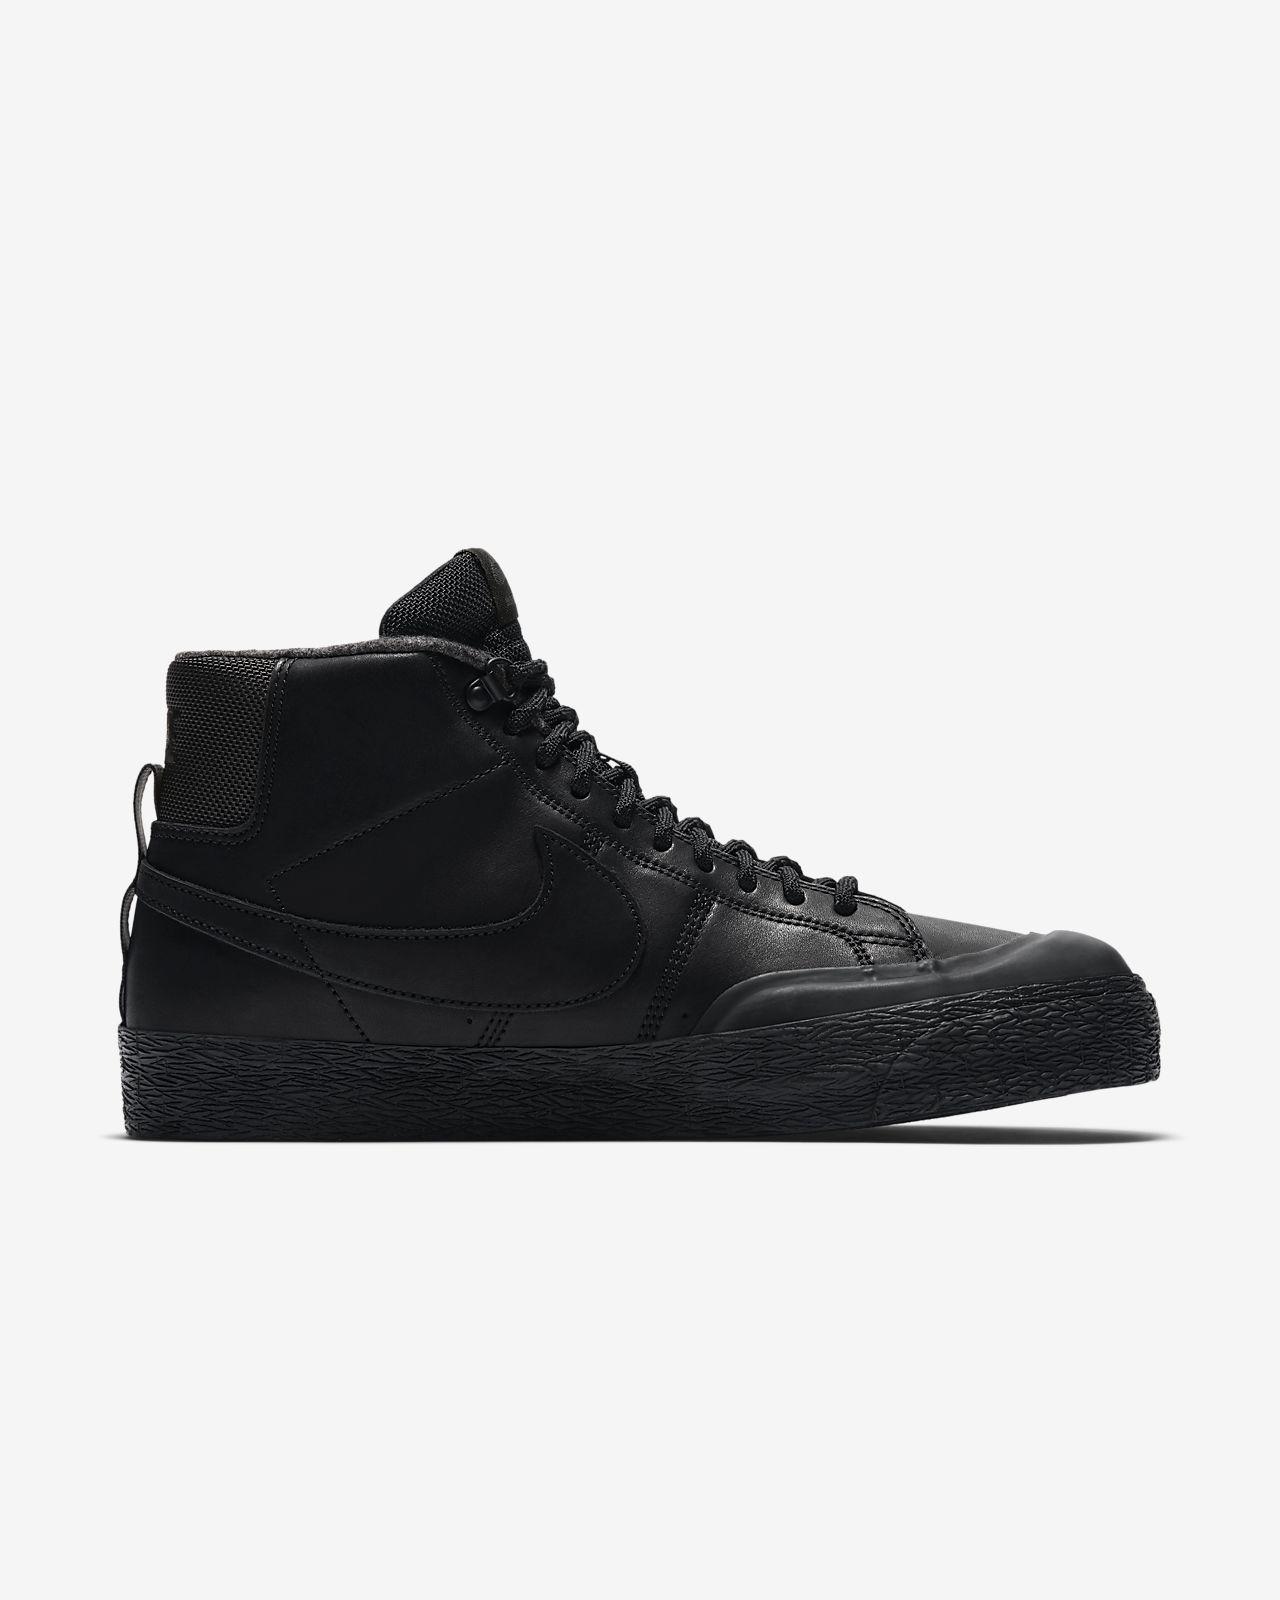 Nike SB Zoom Blazer Mid XT Bota Men's Skateboarding Shoes Black vM3149N